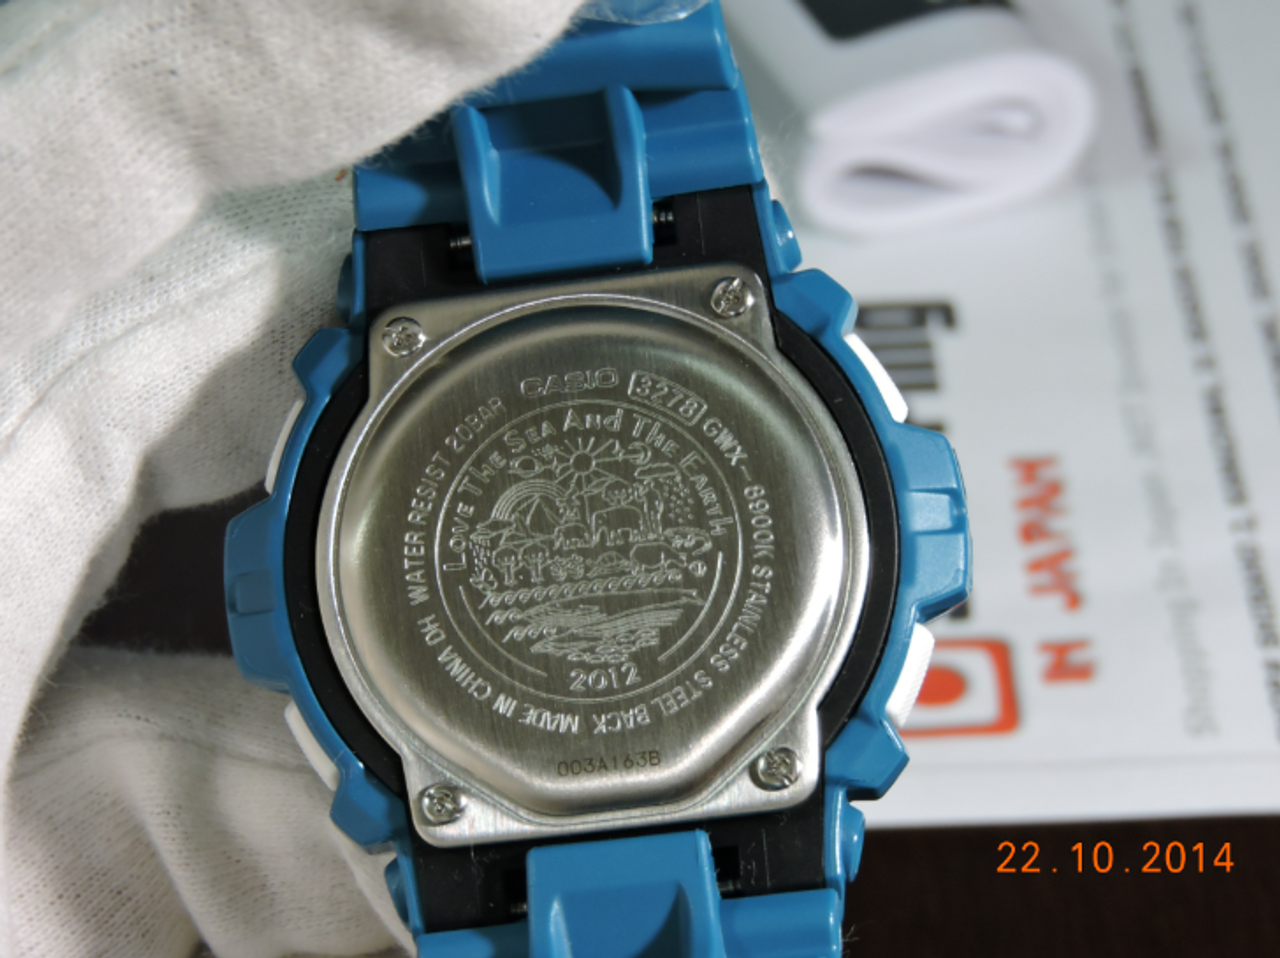 GWX-8900K